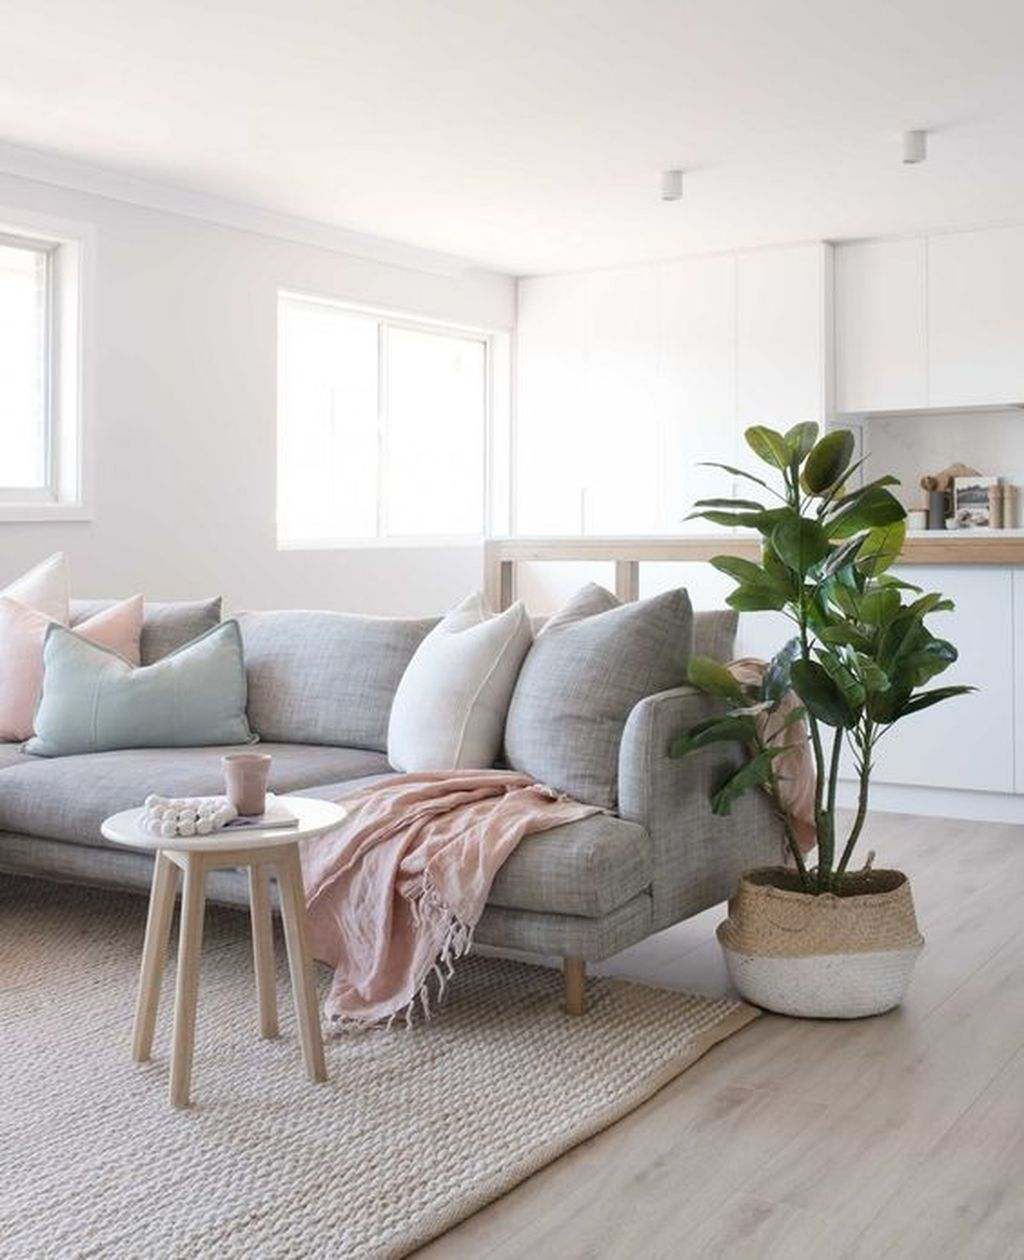 34 awesome minimalist contemporary living room decor ideas